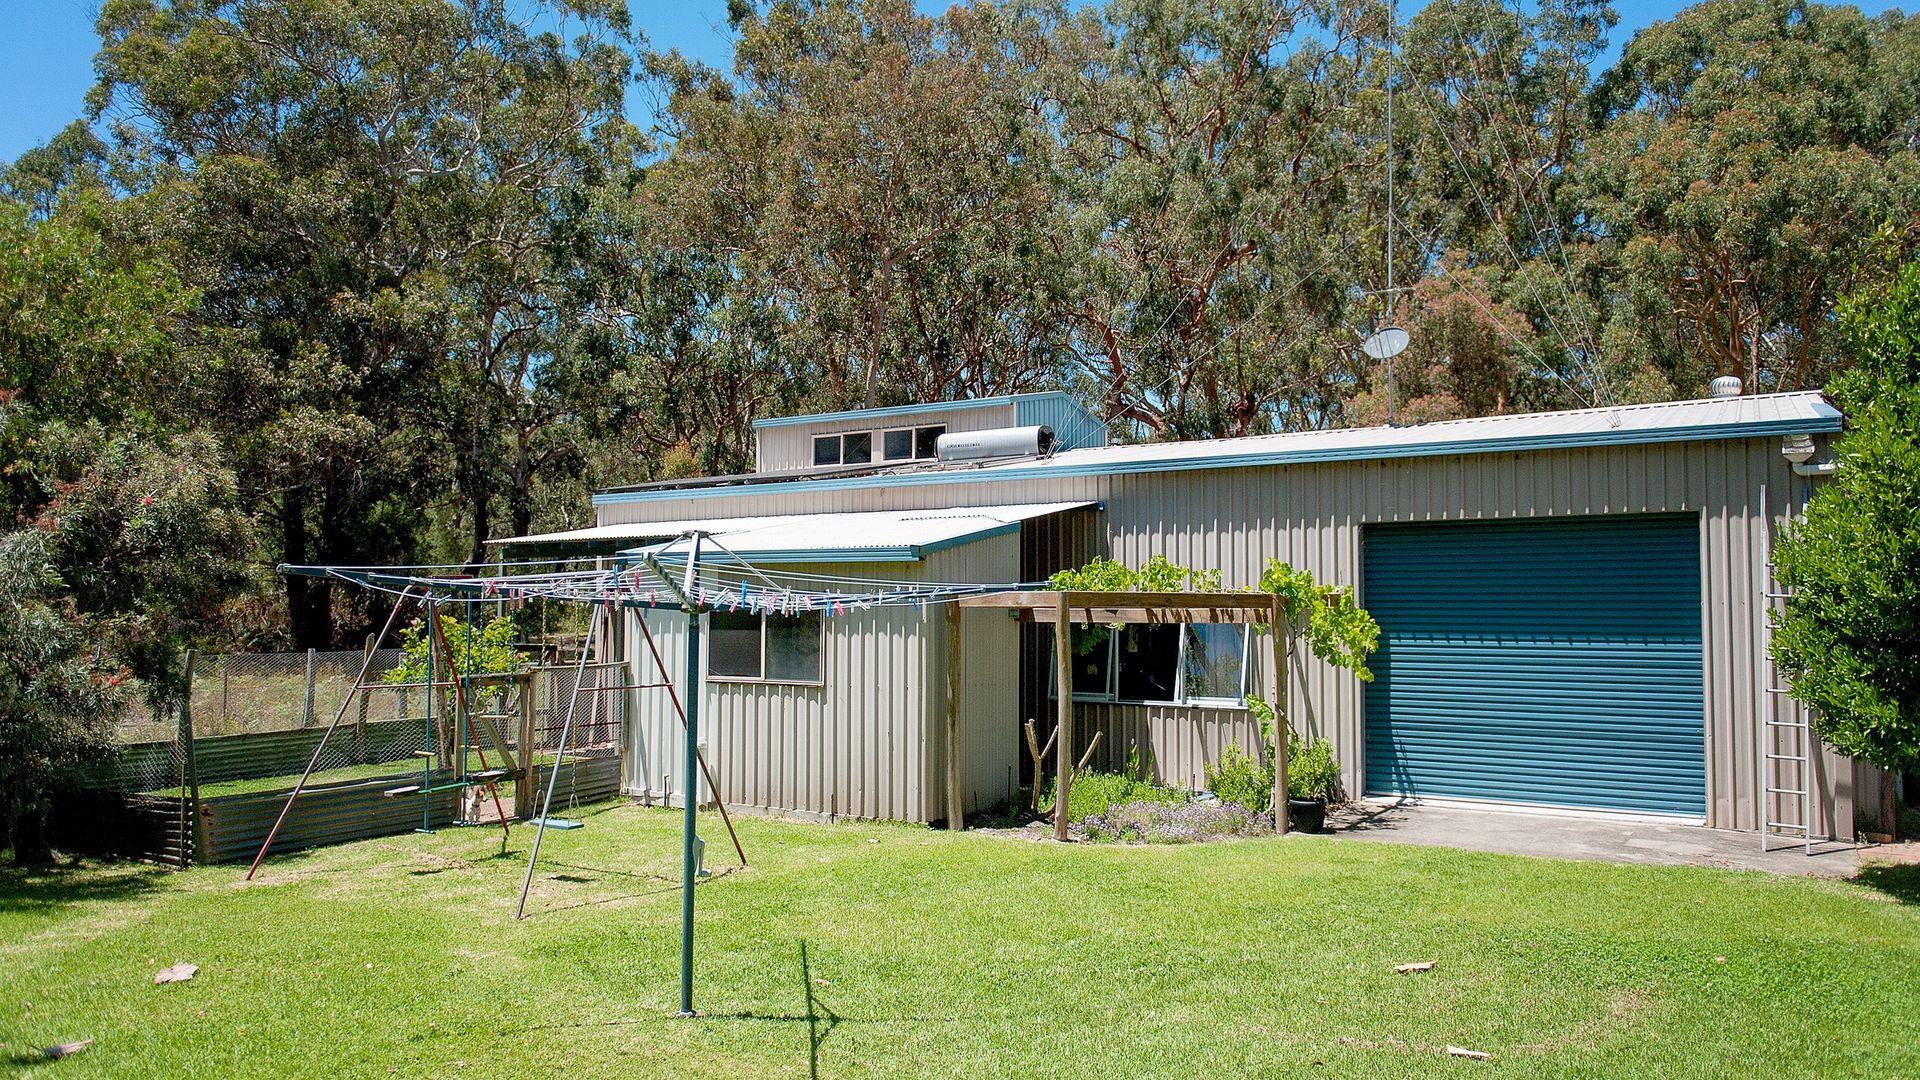 3469 - 3479 Nelson Bay Road, Bobs Farm NSW 2316, Image 1